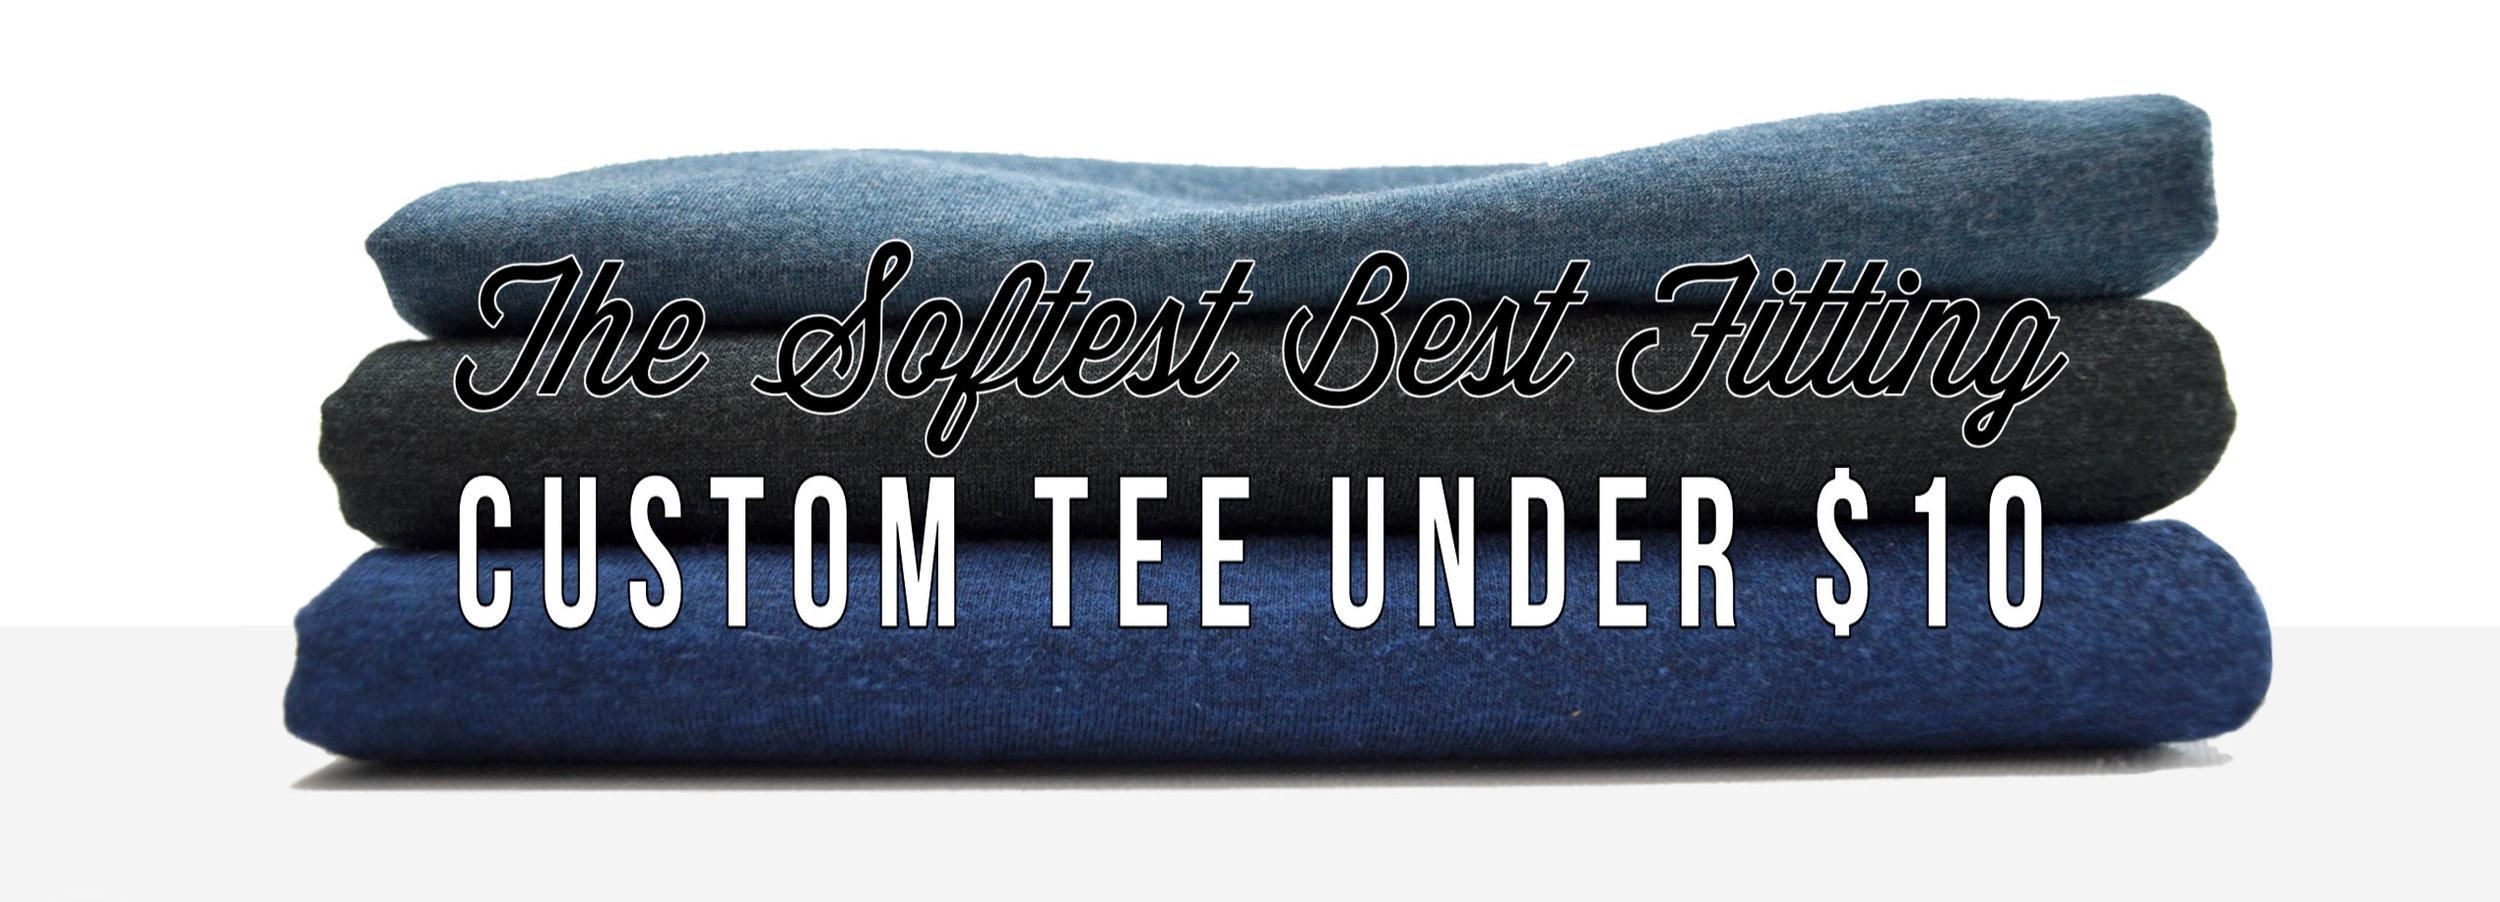 The-Best-10-Dollar-Shirt.jpg